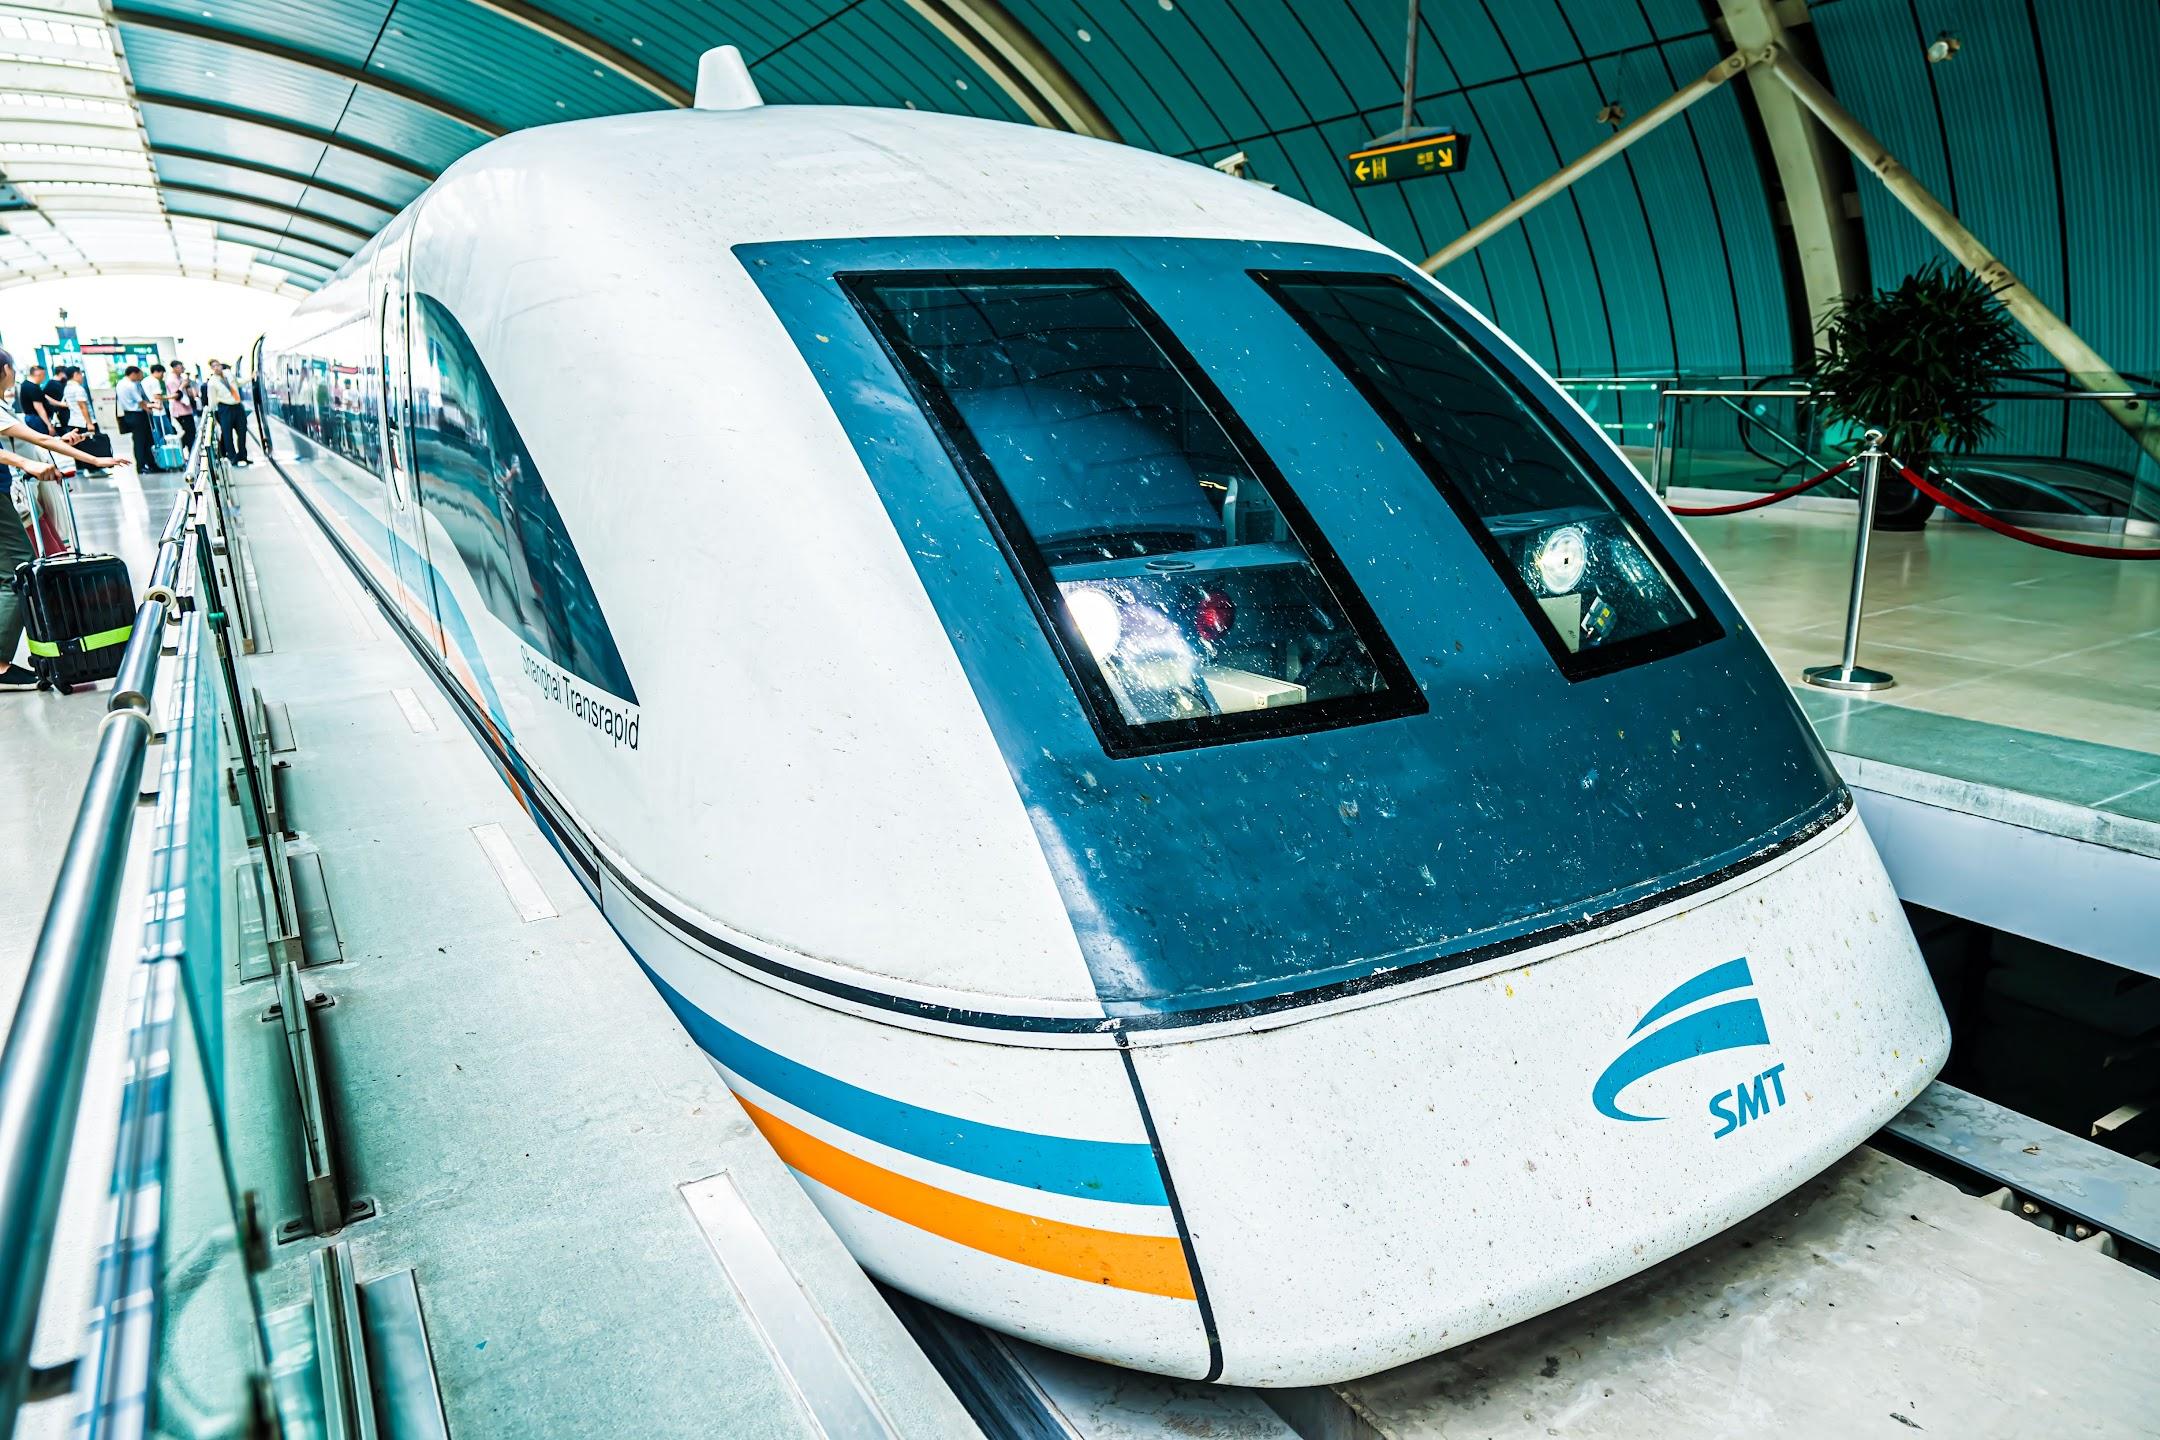 Shanghai Maglev train2